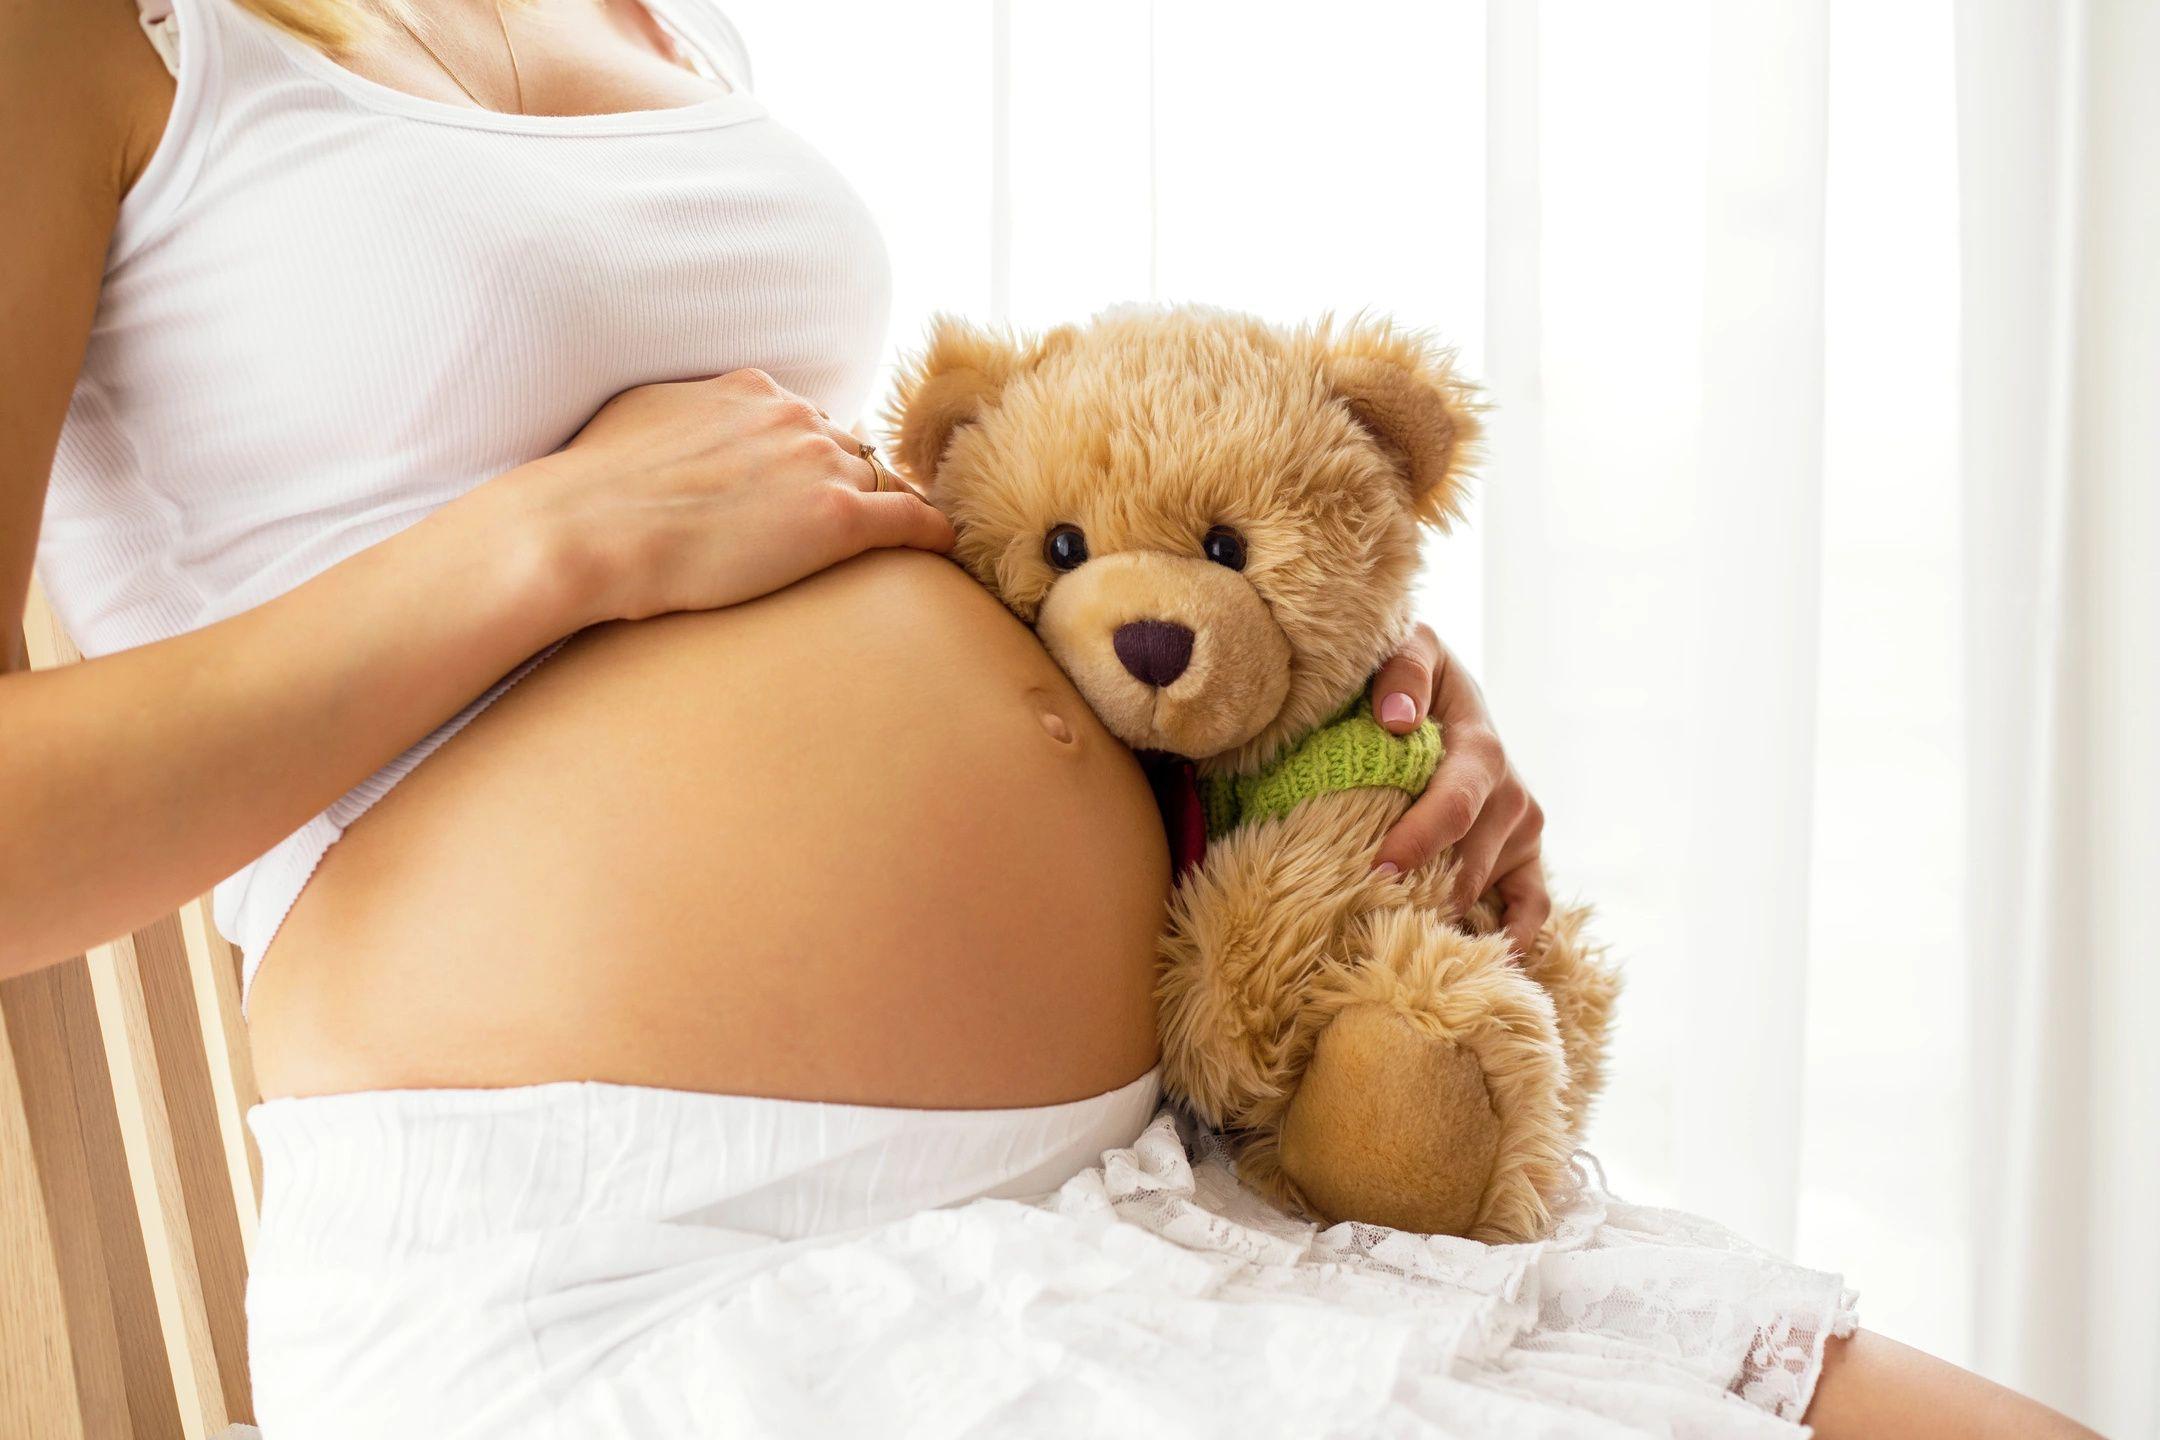 American Academy of Pediatrics Urges Pregnant and Nursing Mothers to Avoid Marijuana Use